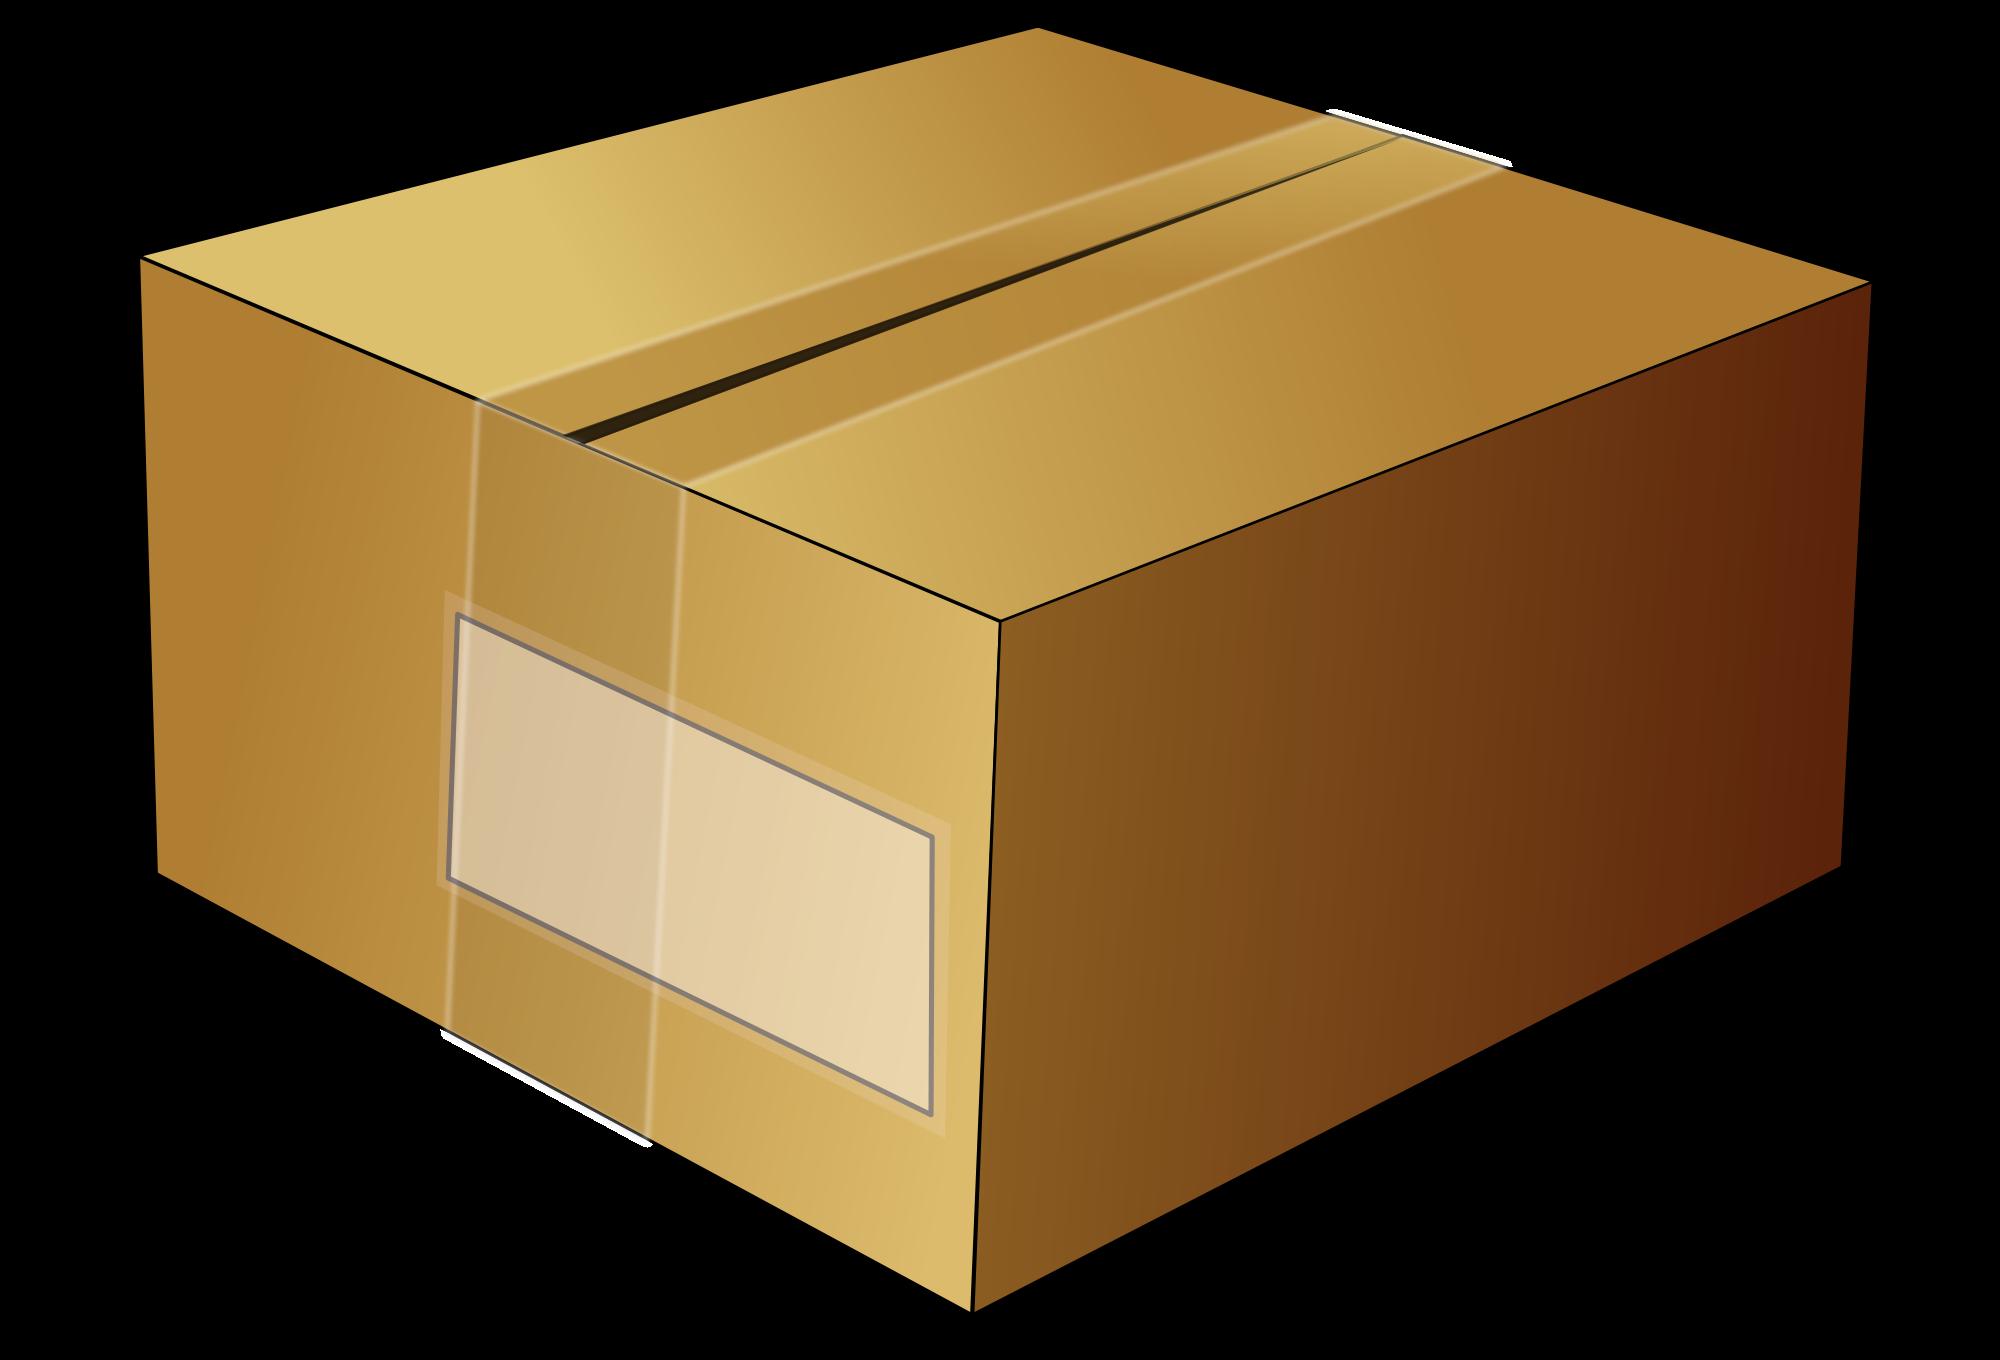 Box svg #12, Download drawings